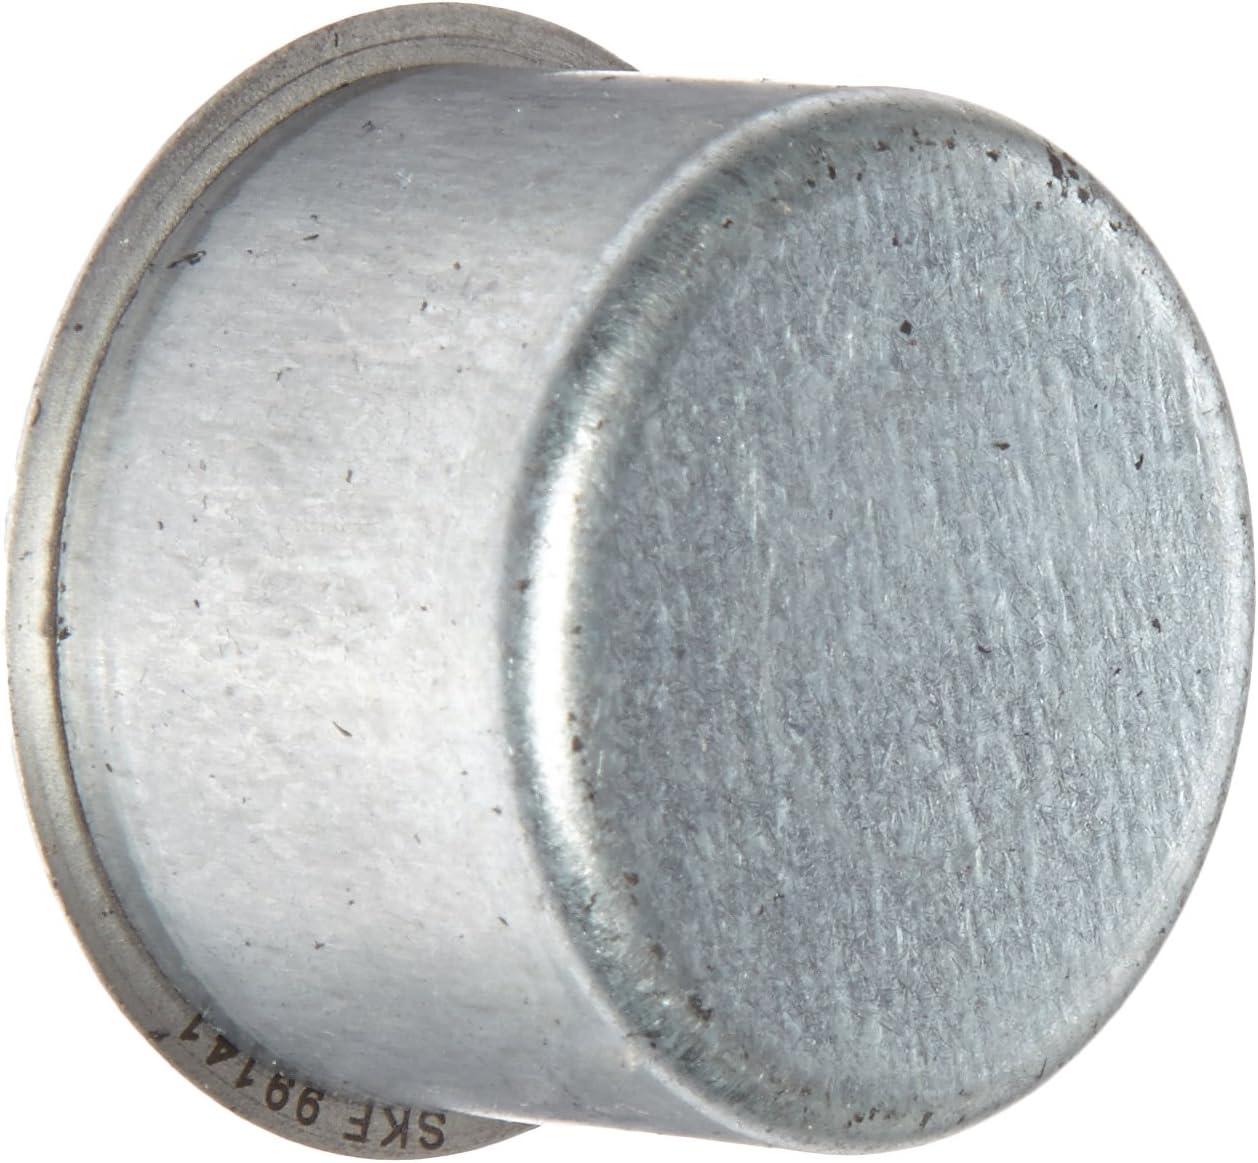 SKF 99141 Speedi Sleeve, SSLEEVE Style, Metric, 31.5mm Shaft Dia